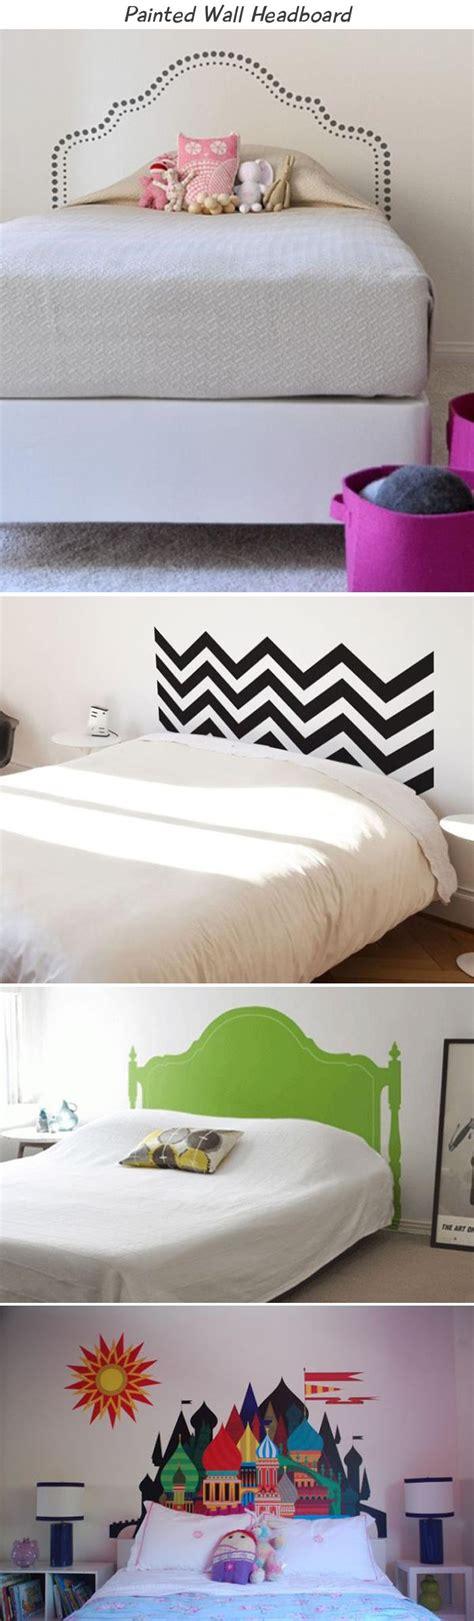 painted wall headboard amazing headboard ideas 12 pics